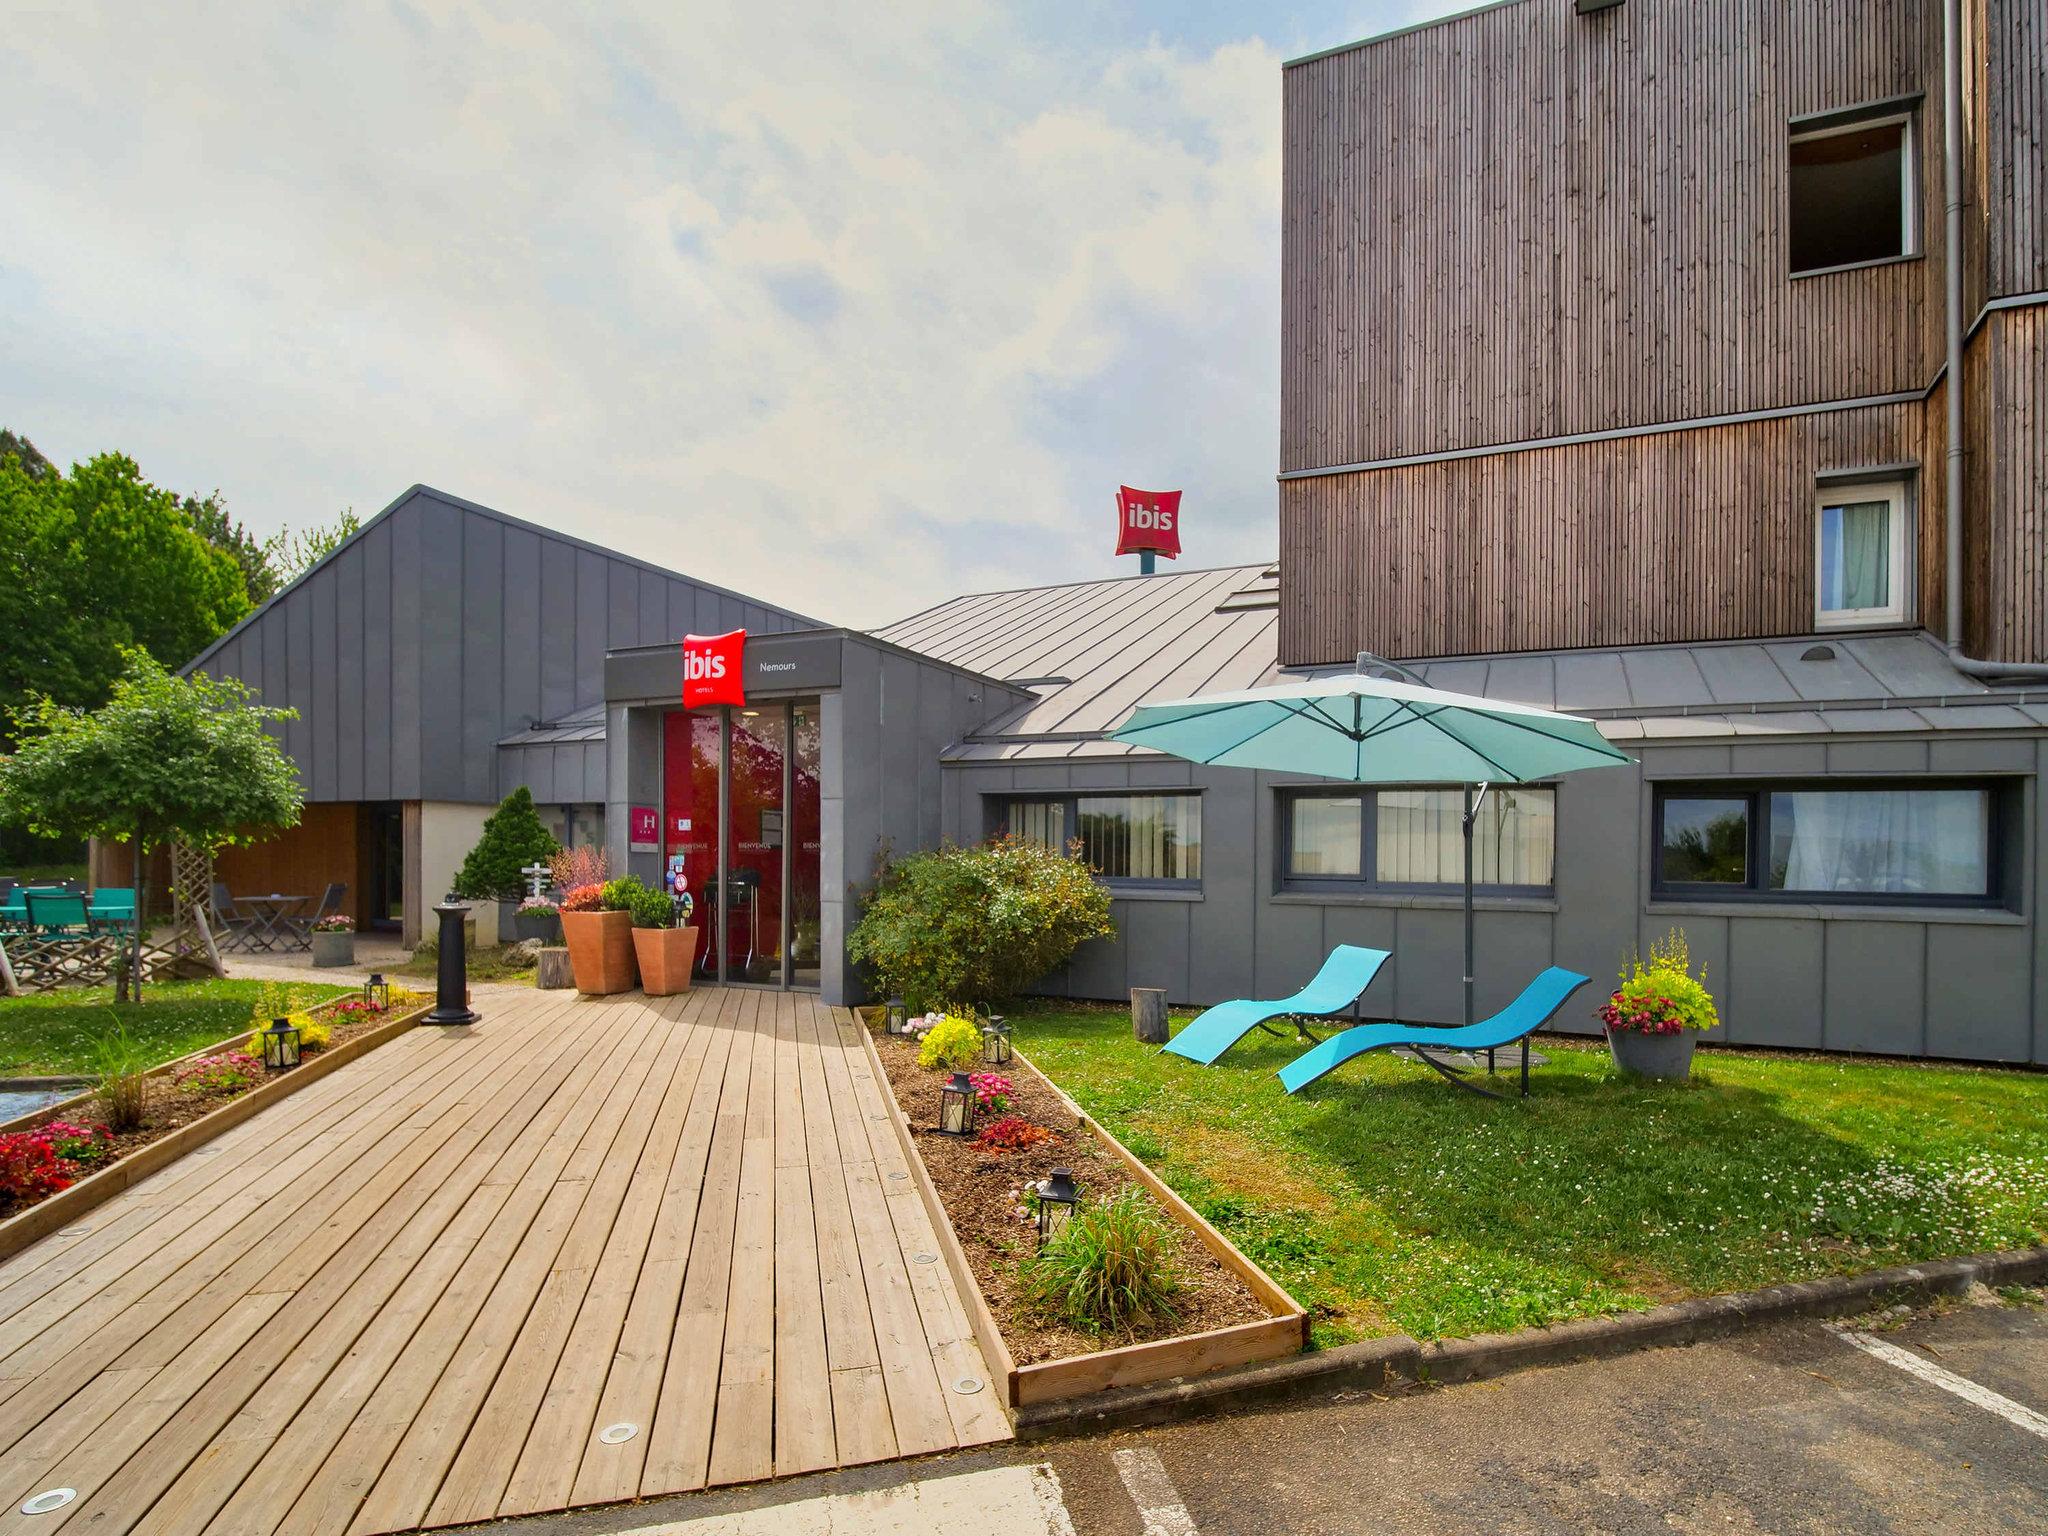 Ibis Hotel Nemours